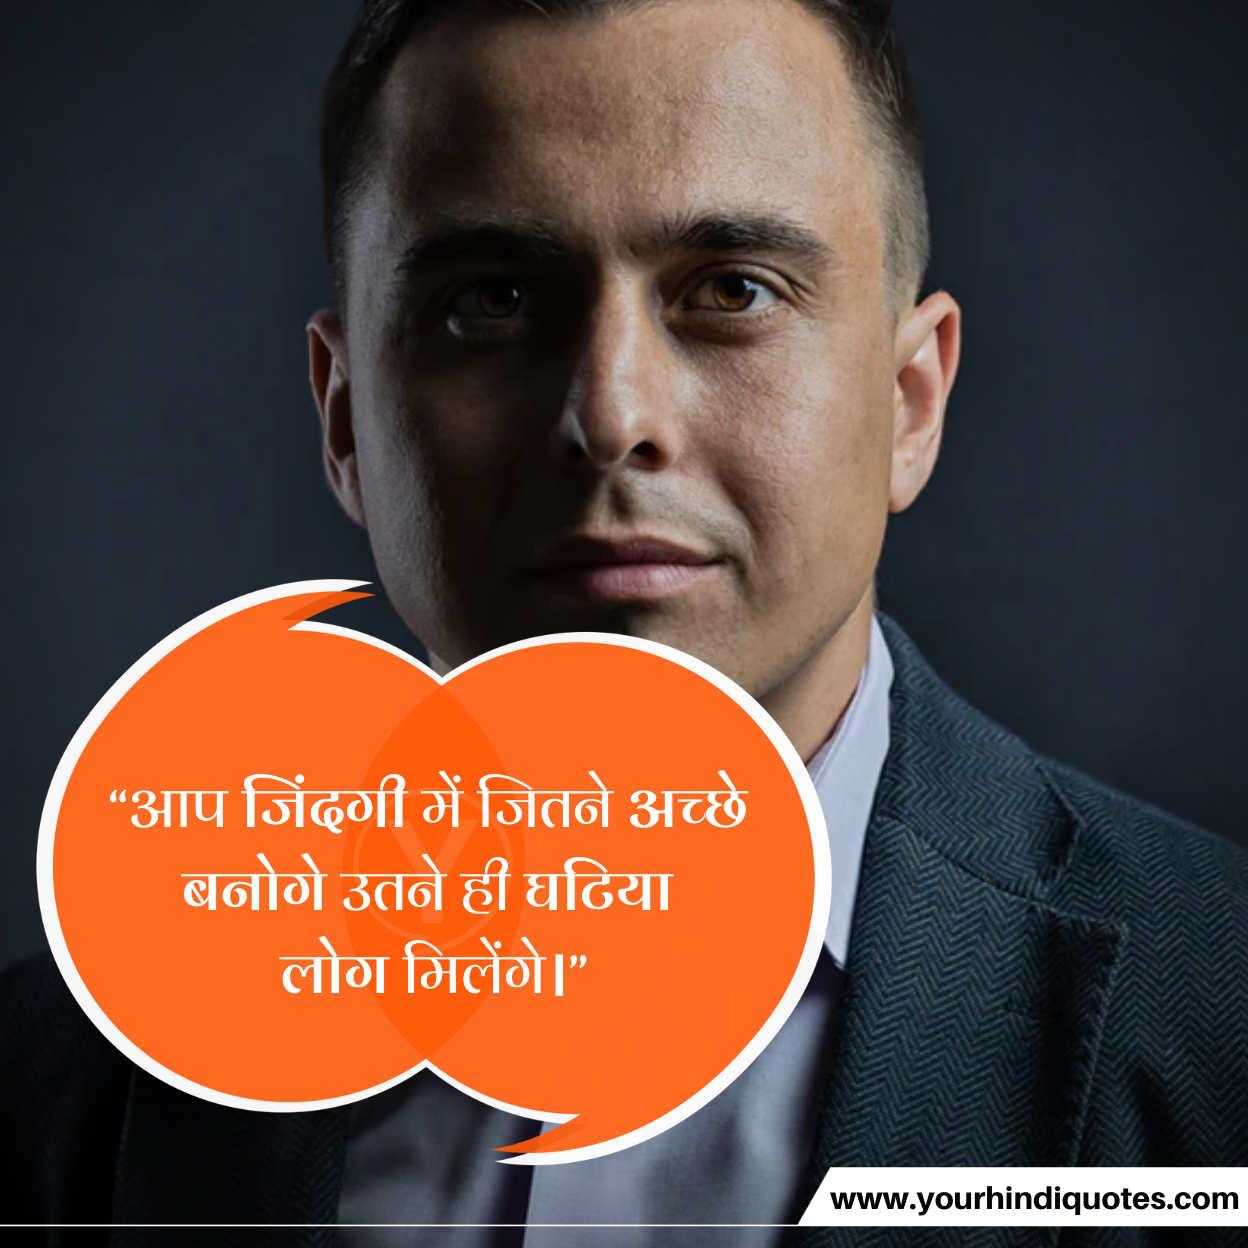 Hindi Best Life Quotes Pics